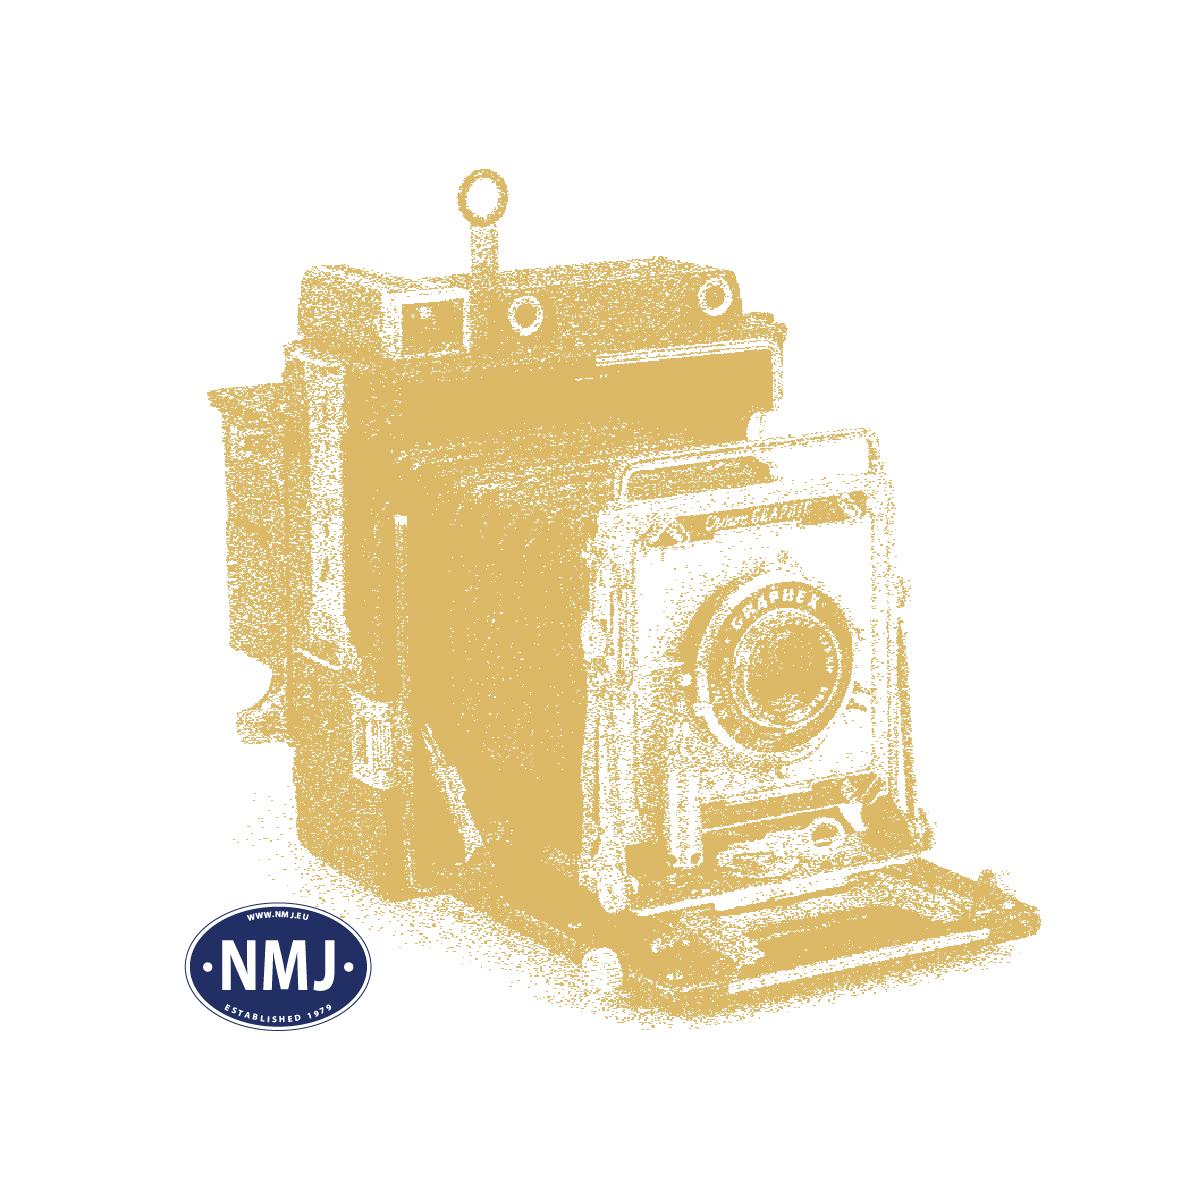 PPA63052 - Minipensler for smussing